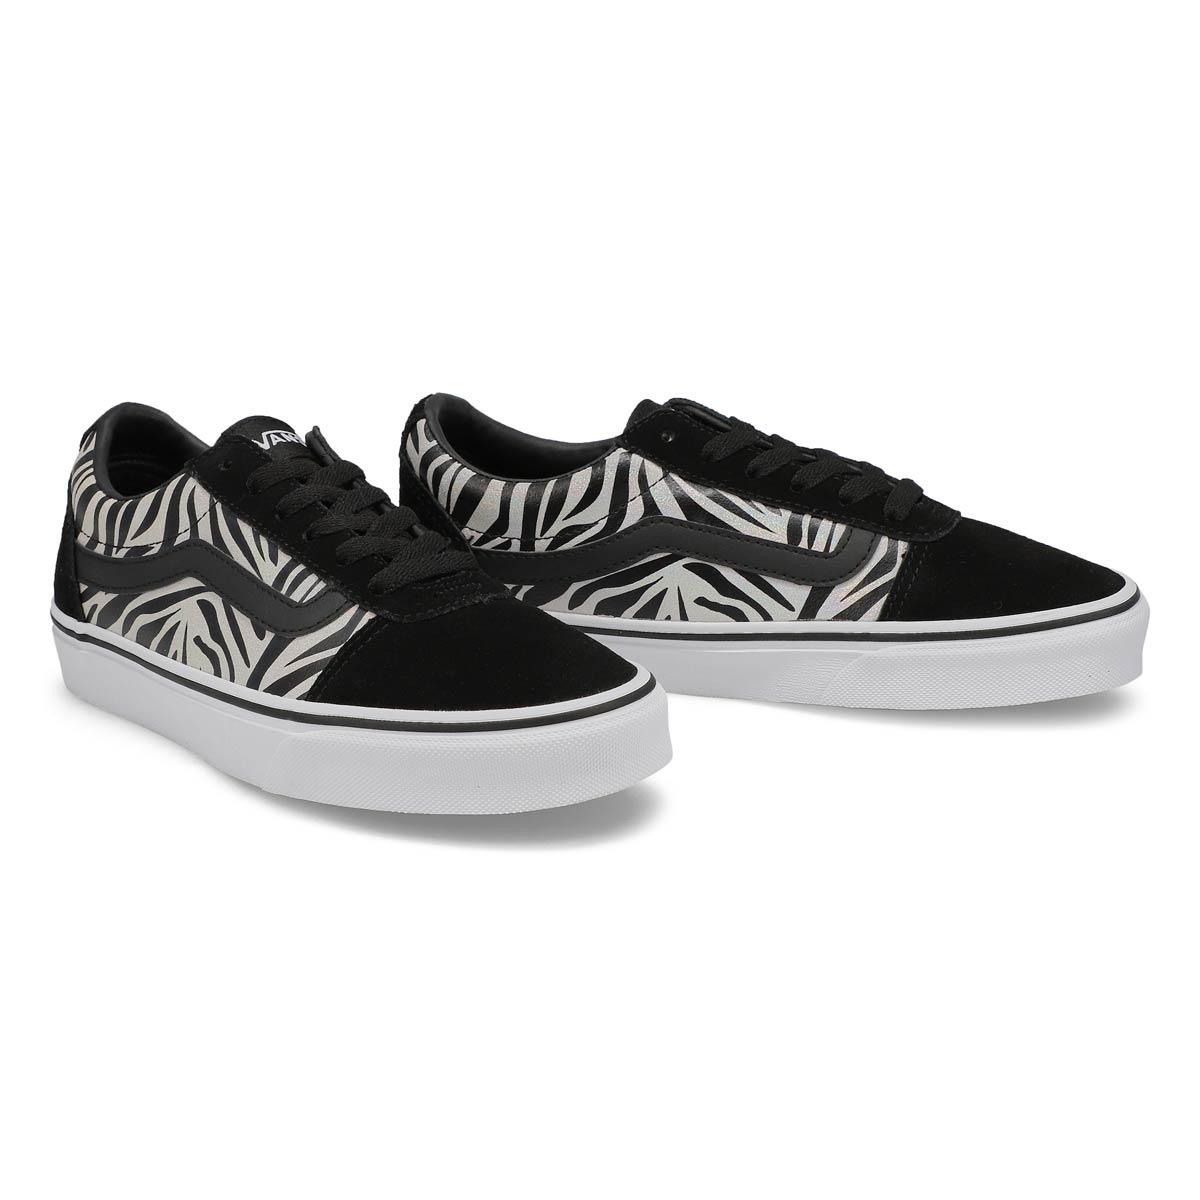 Women's Ward Sneaker - Metallic Zebra/Blk/Wht